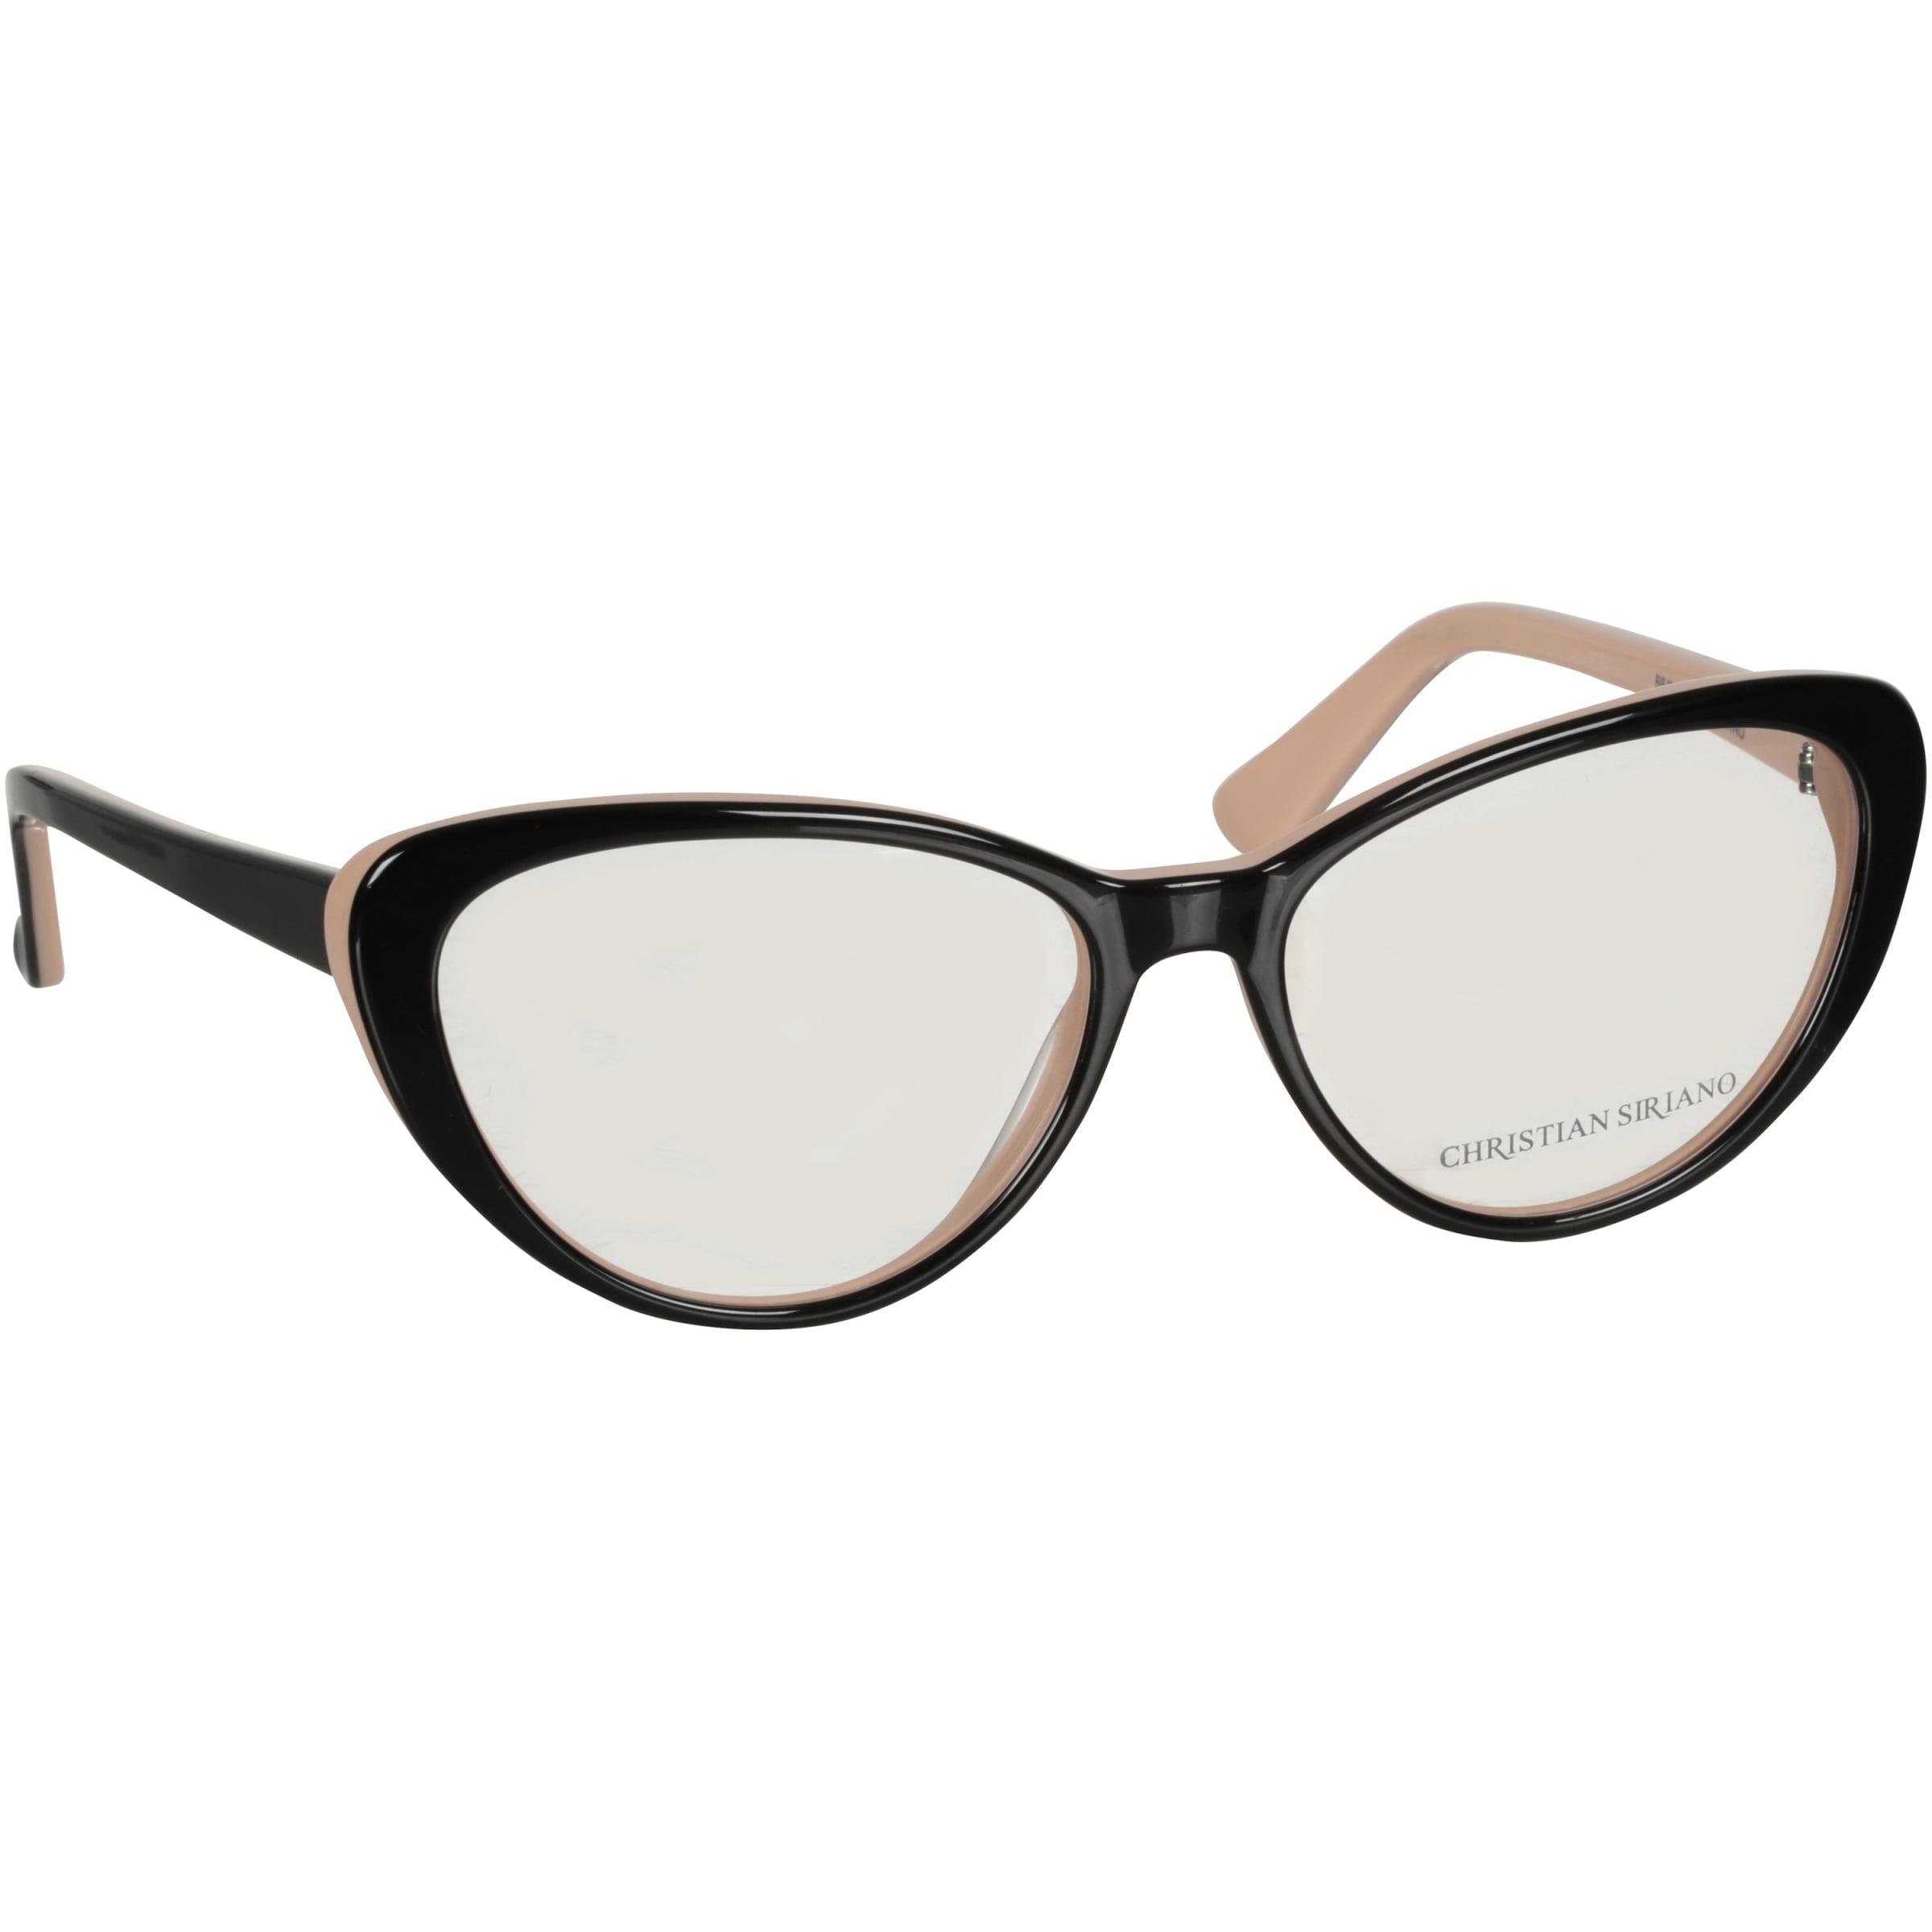 9d5e14930b6 Christian Siriano Eyeglass Frames